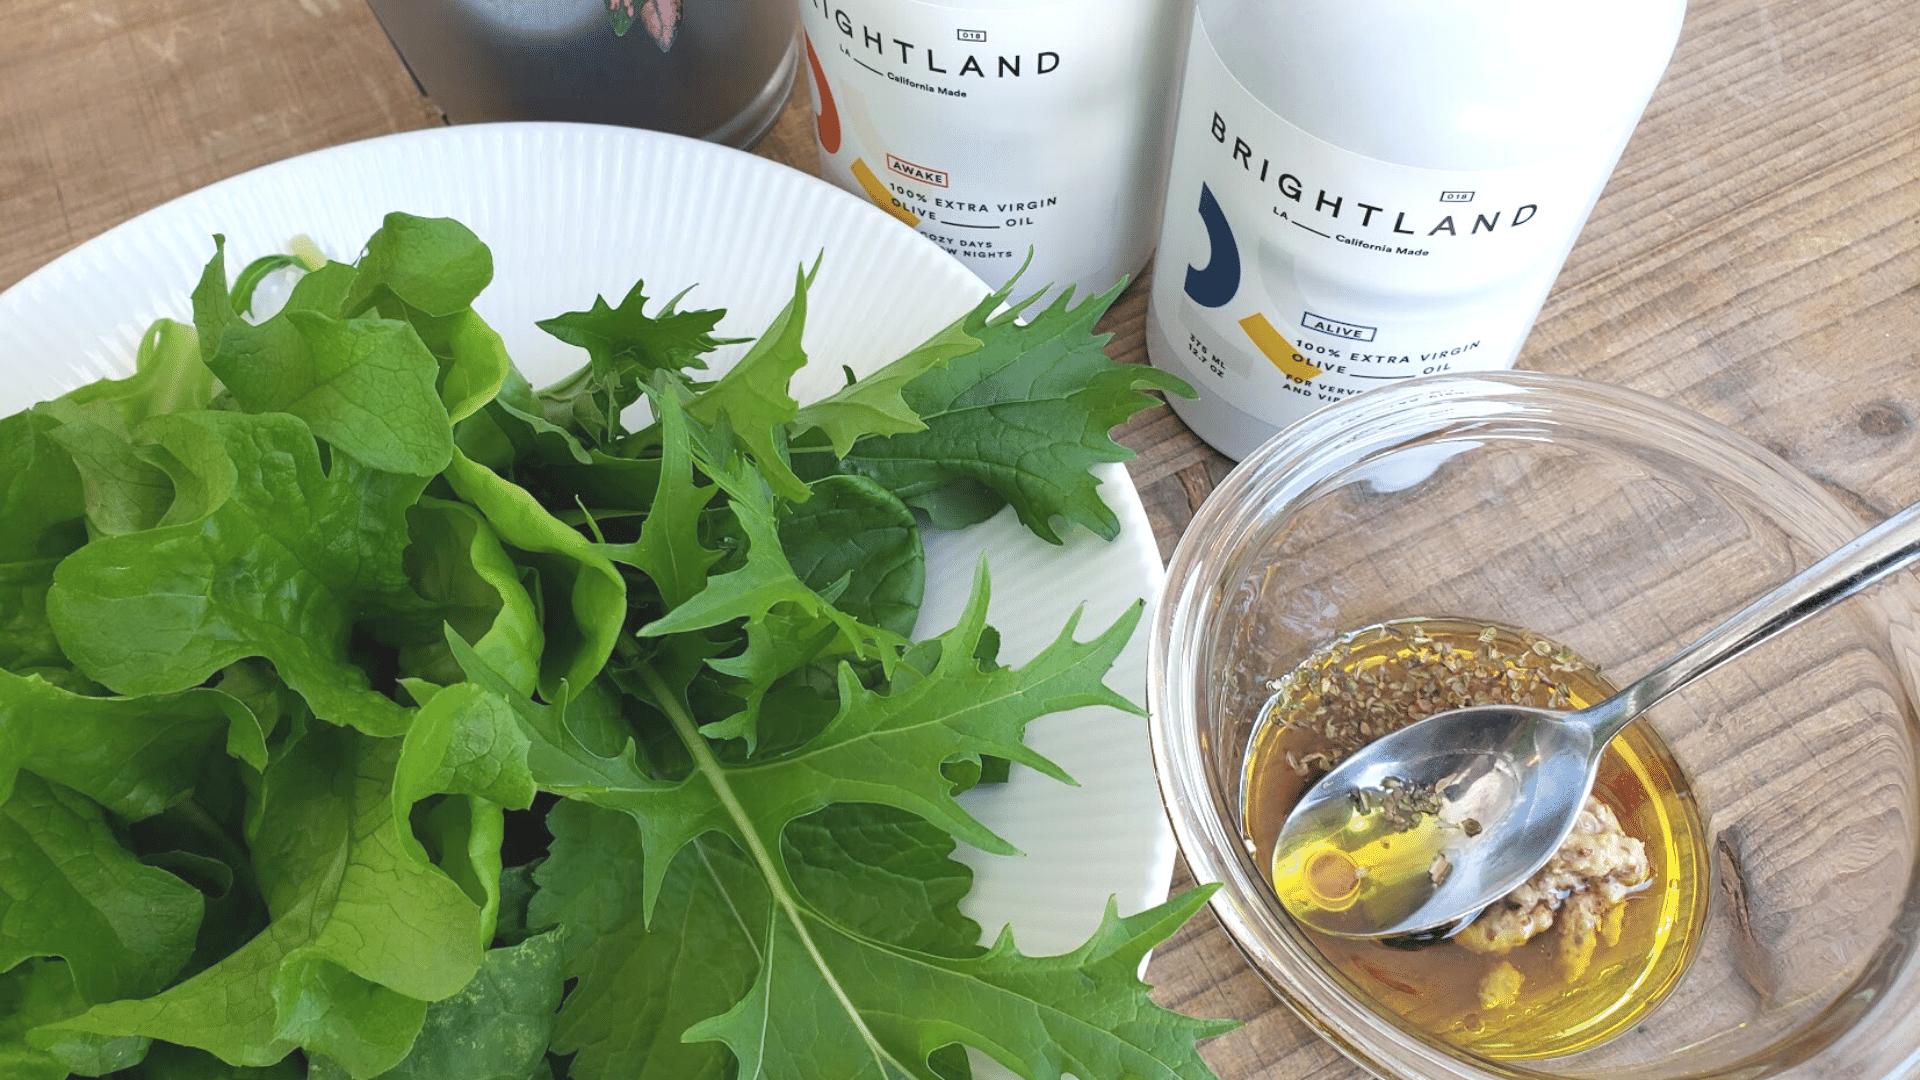 BRIGHTLAND Olive Oils – Making The Perfect Salad